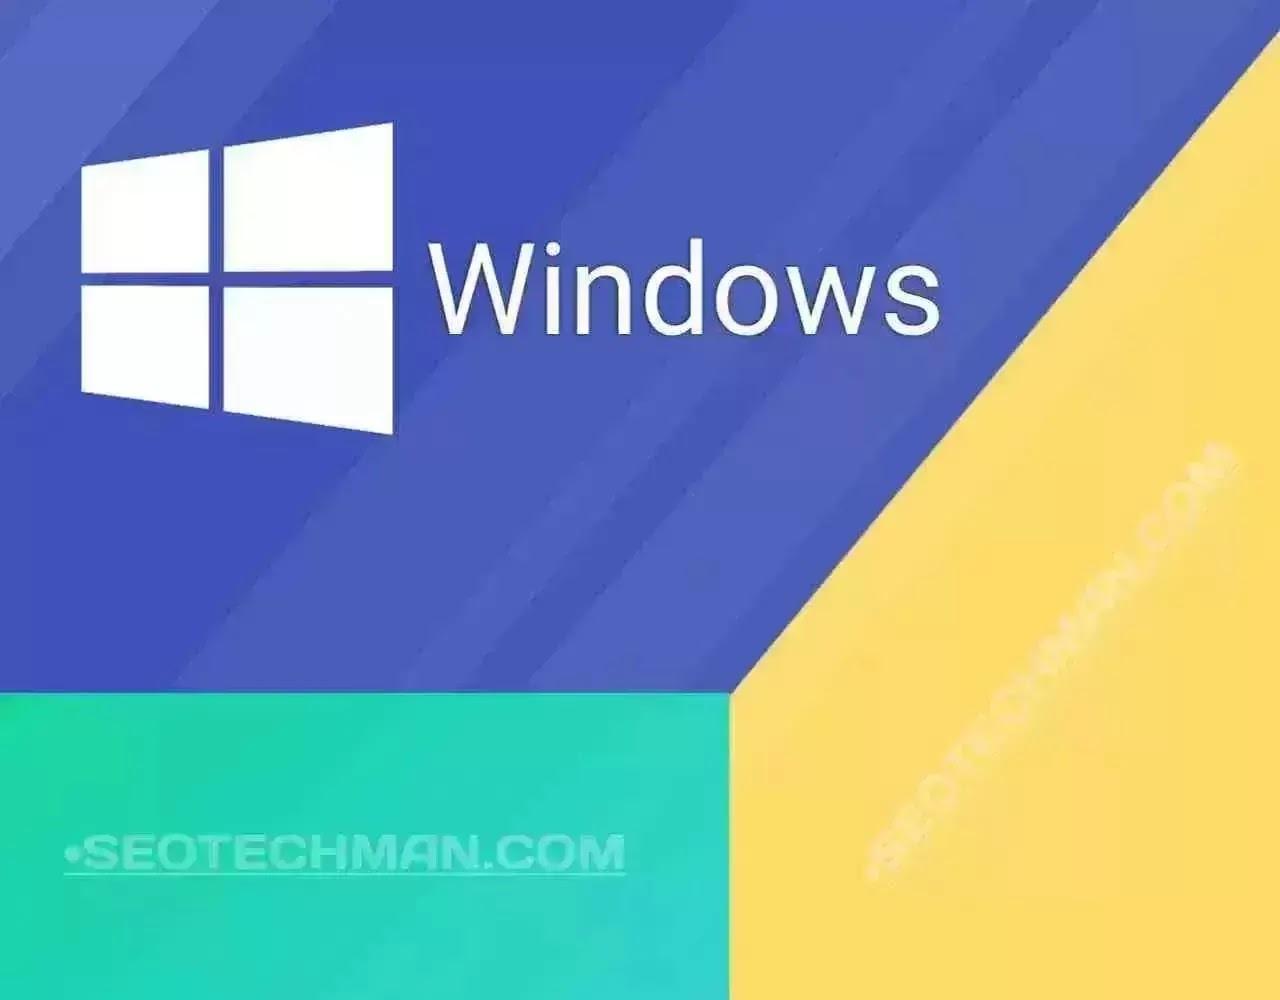 12 Alat Diagnostik Windows Terbaik Untuk PC / Komputer Anda